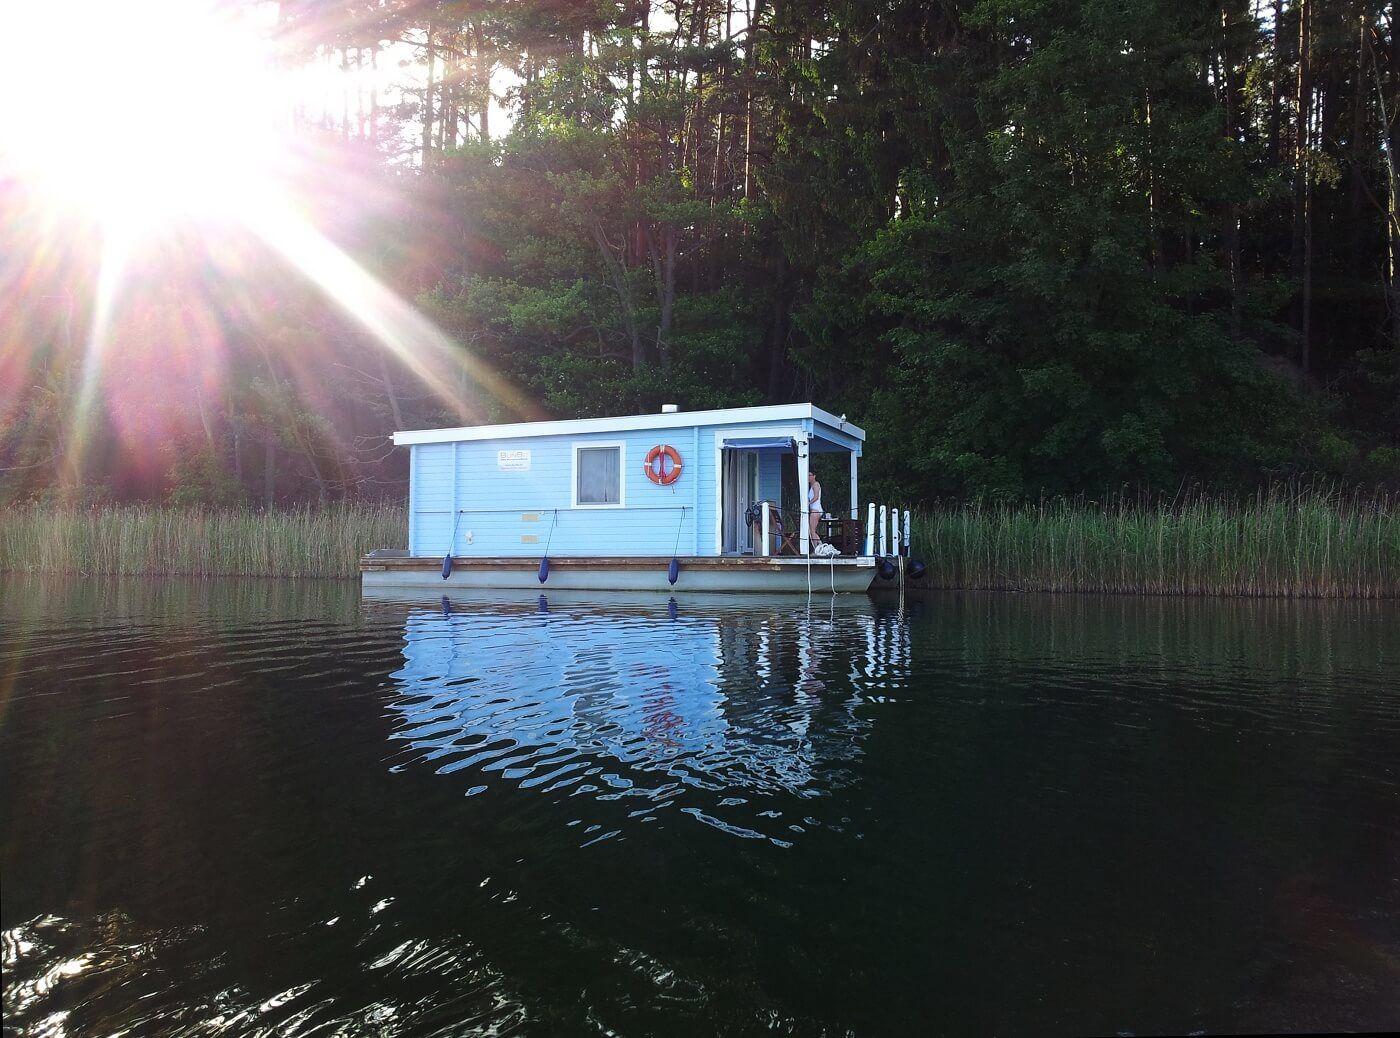 BunBo 990D Hausboot, Hausboot mieten, Style at home